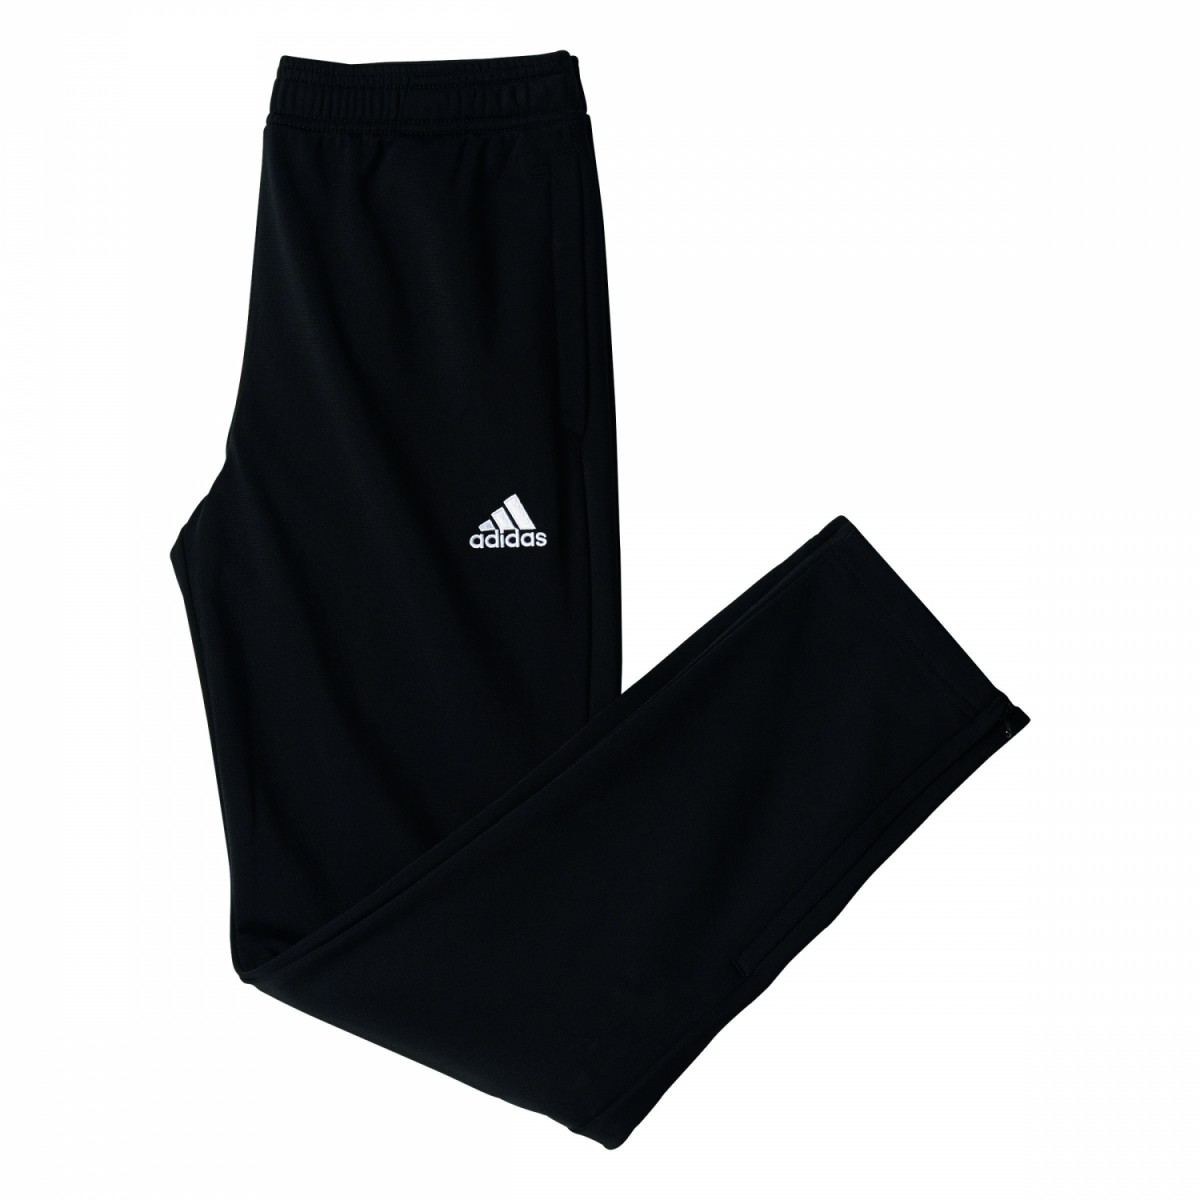 adidas Tiro 17 Trainings Pant Kinder Sporthose schwarz